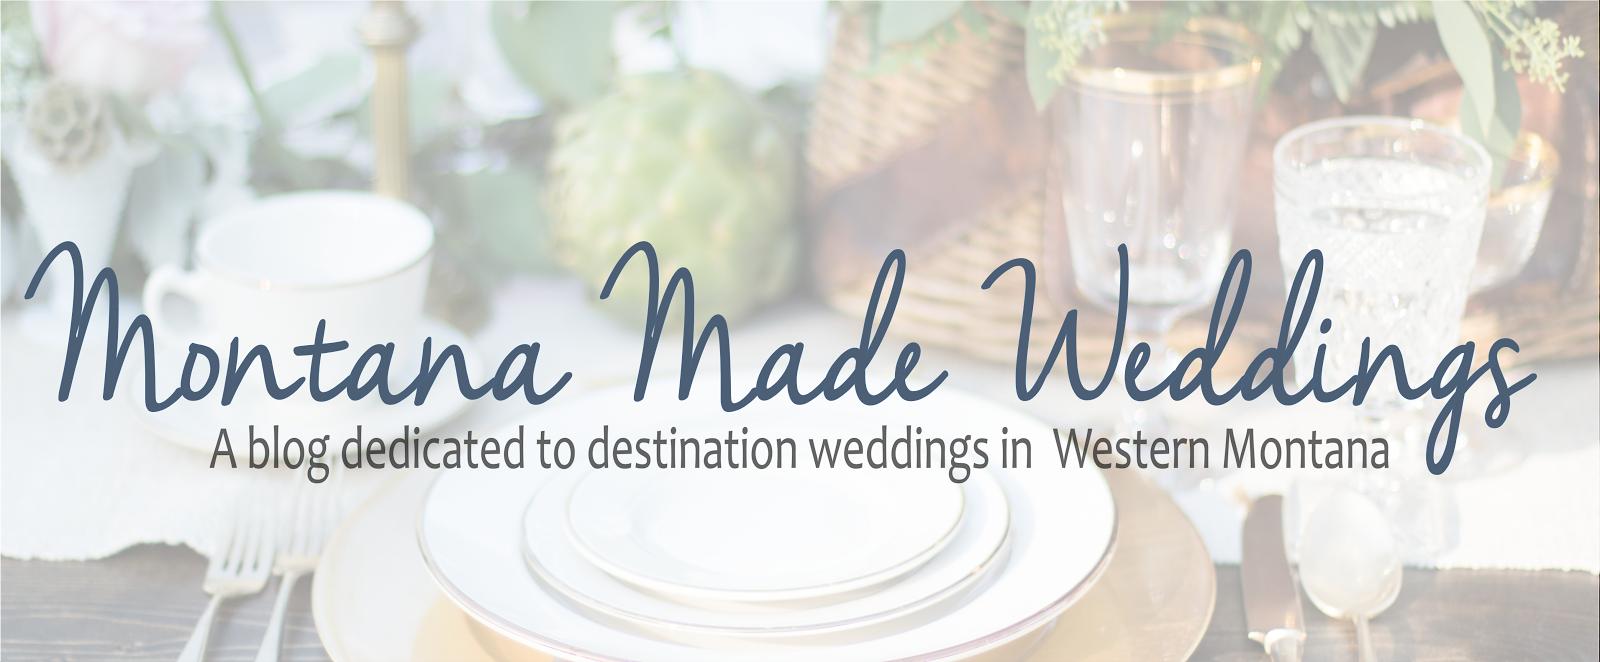 Montana Made Weddings